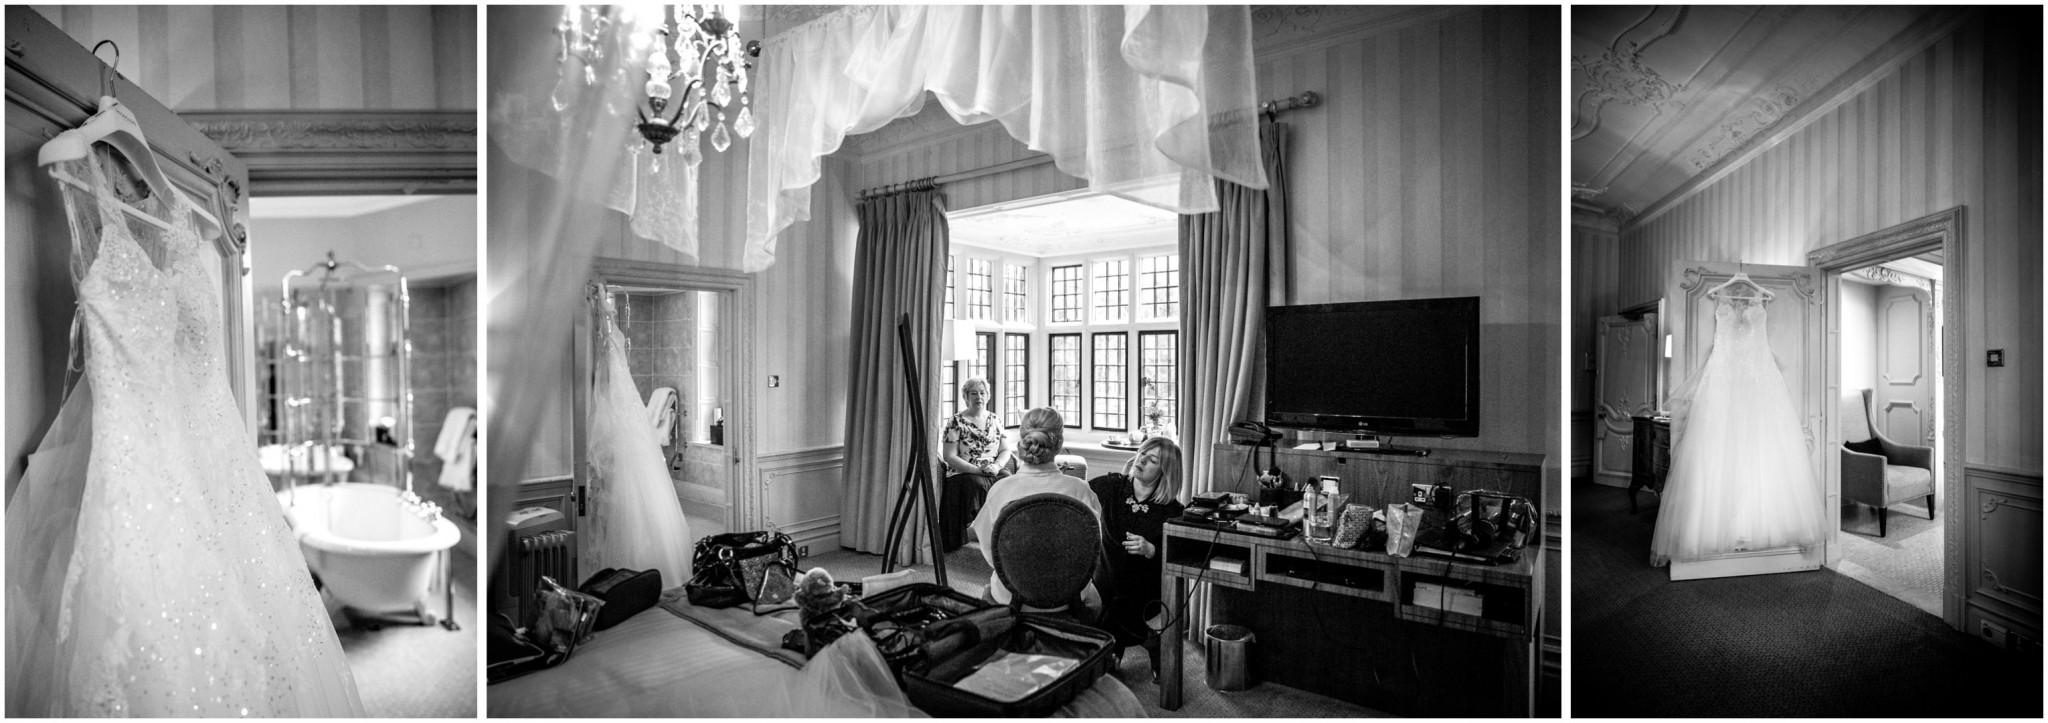 Rhinefield House Wedding Photographer Bridal prep